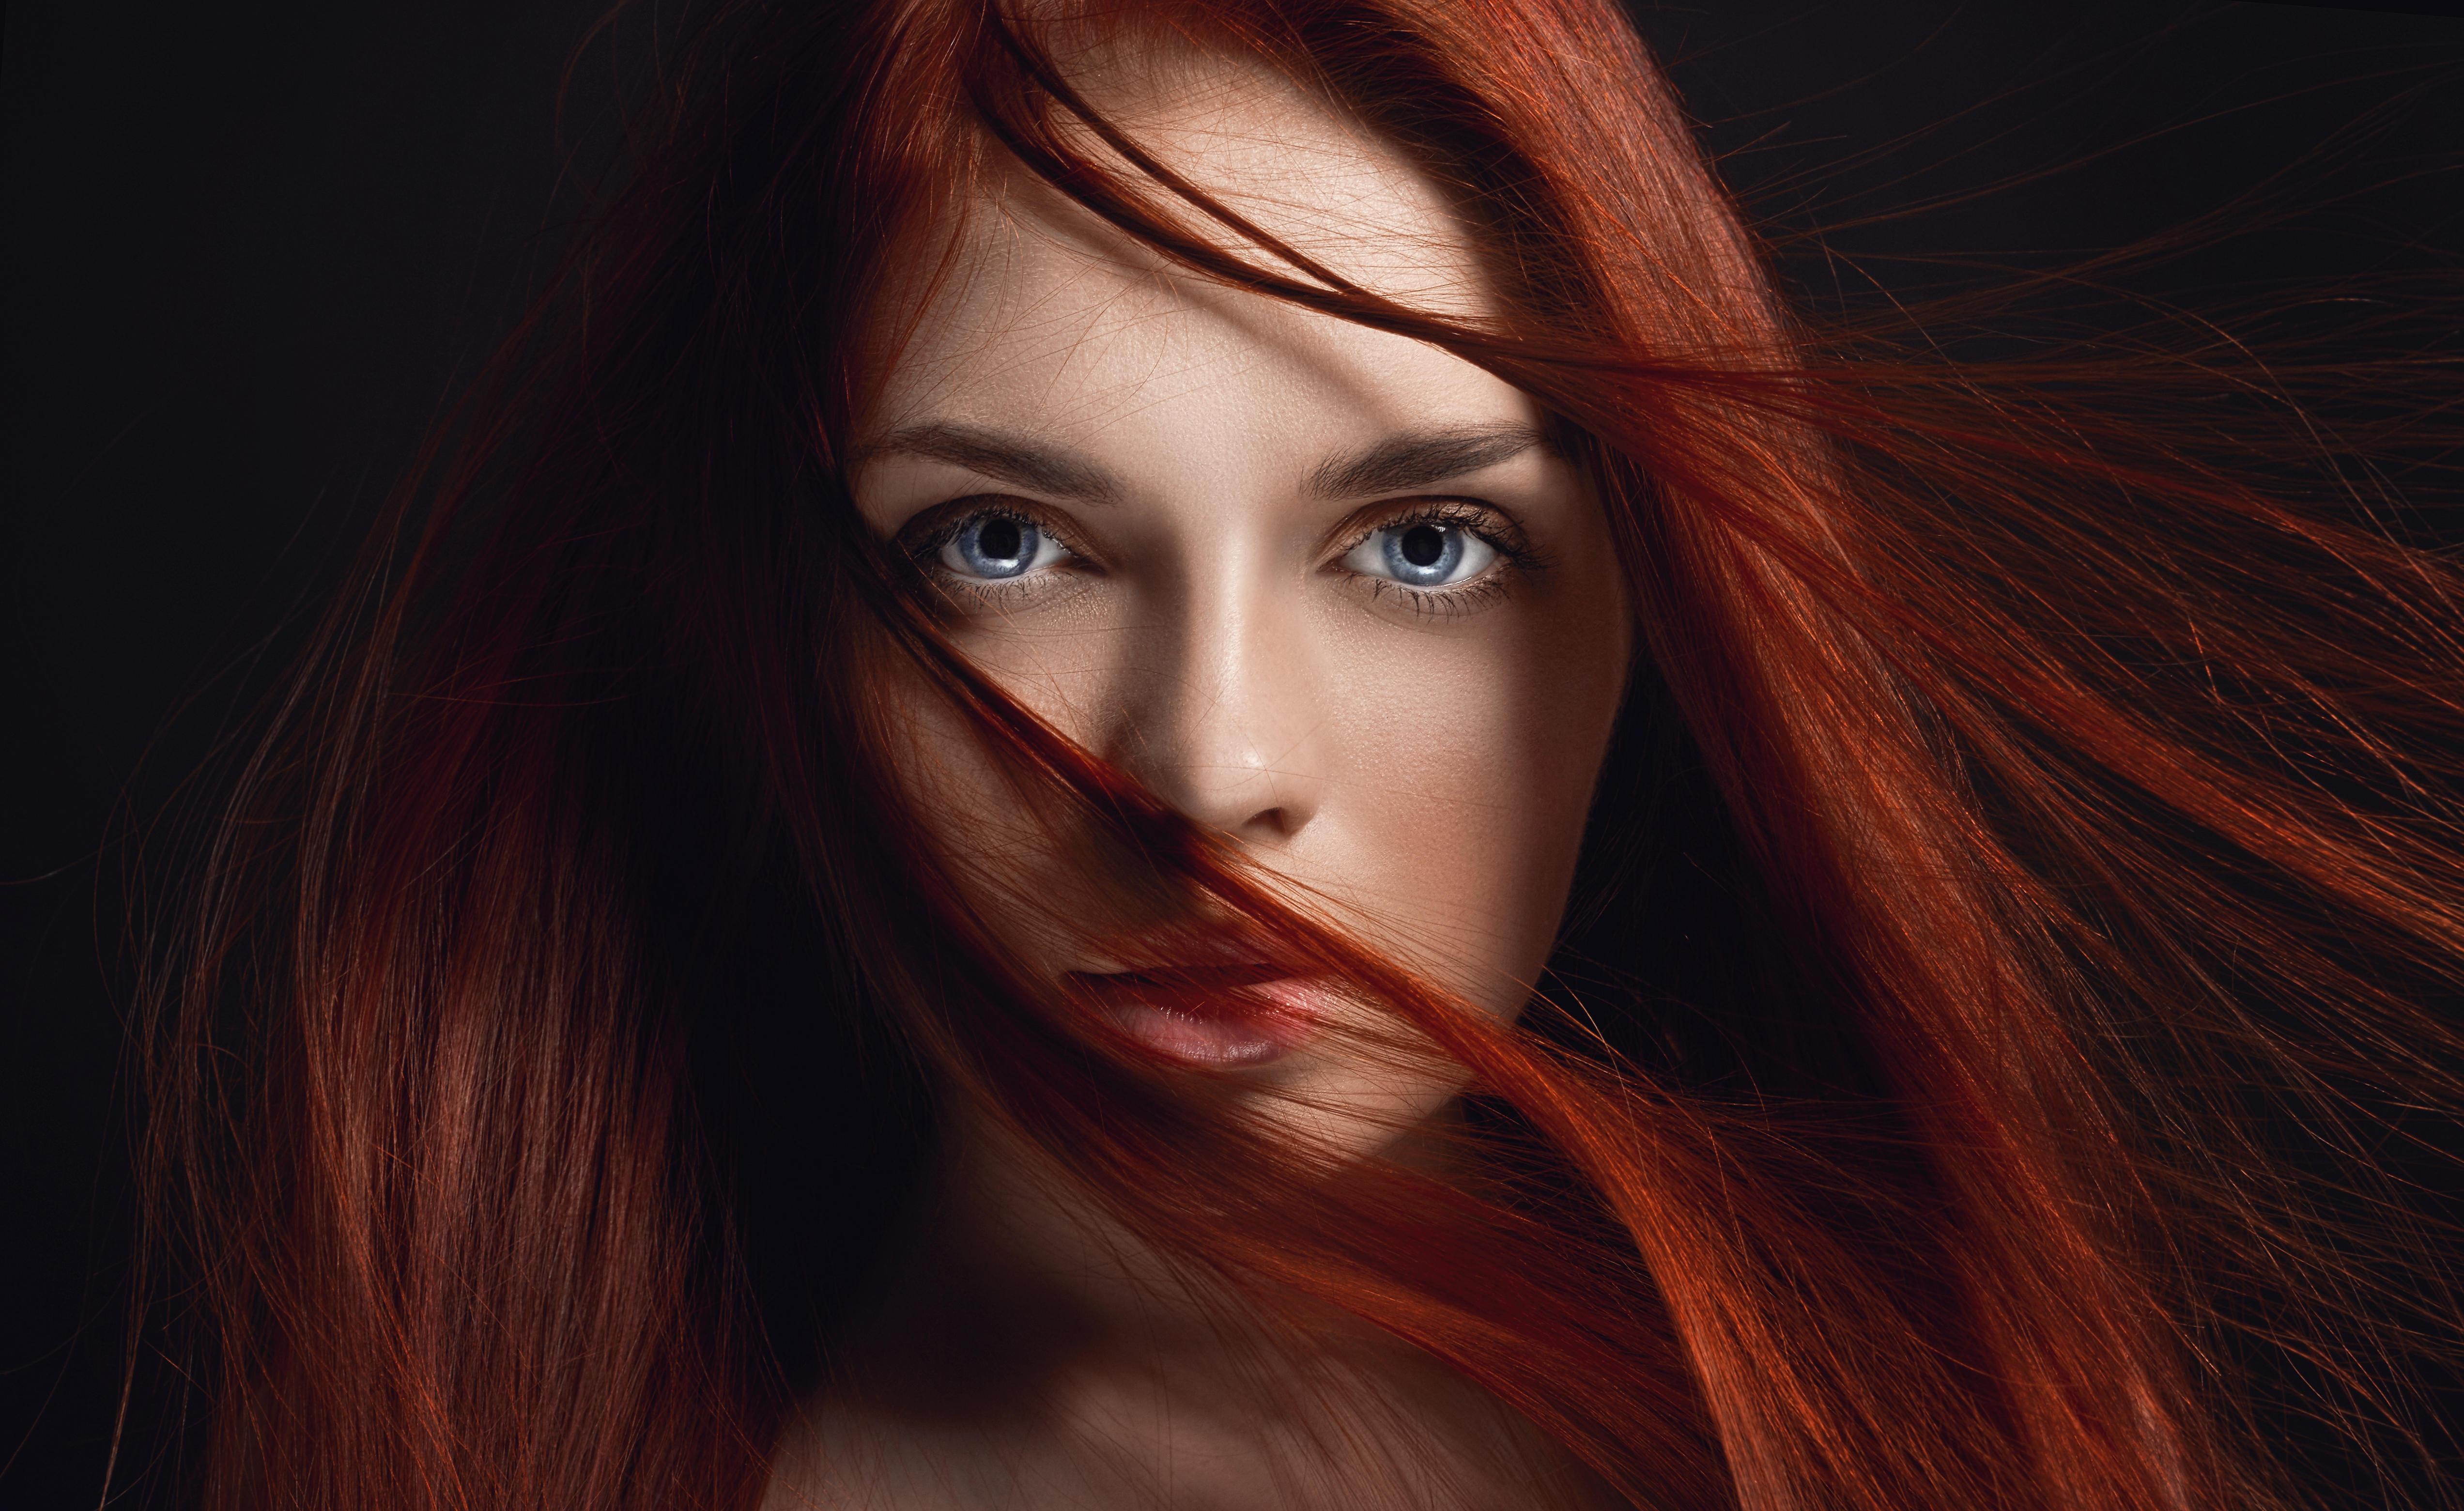 Redhead Girl Hairs On Face 4k 5k Hd